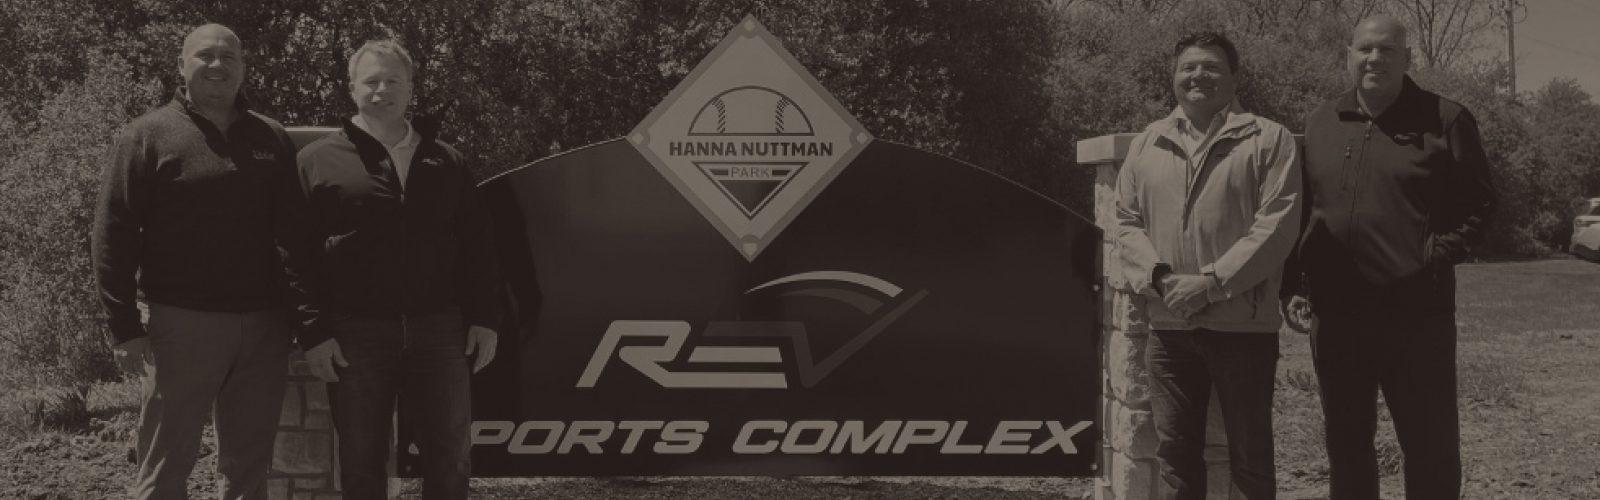 6 Sports Complex Donation Blog Size